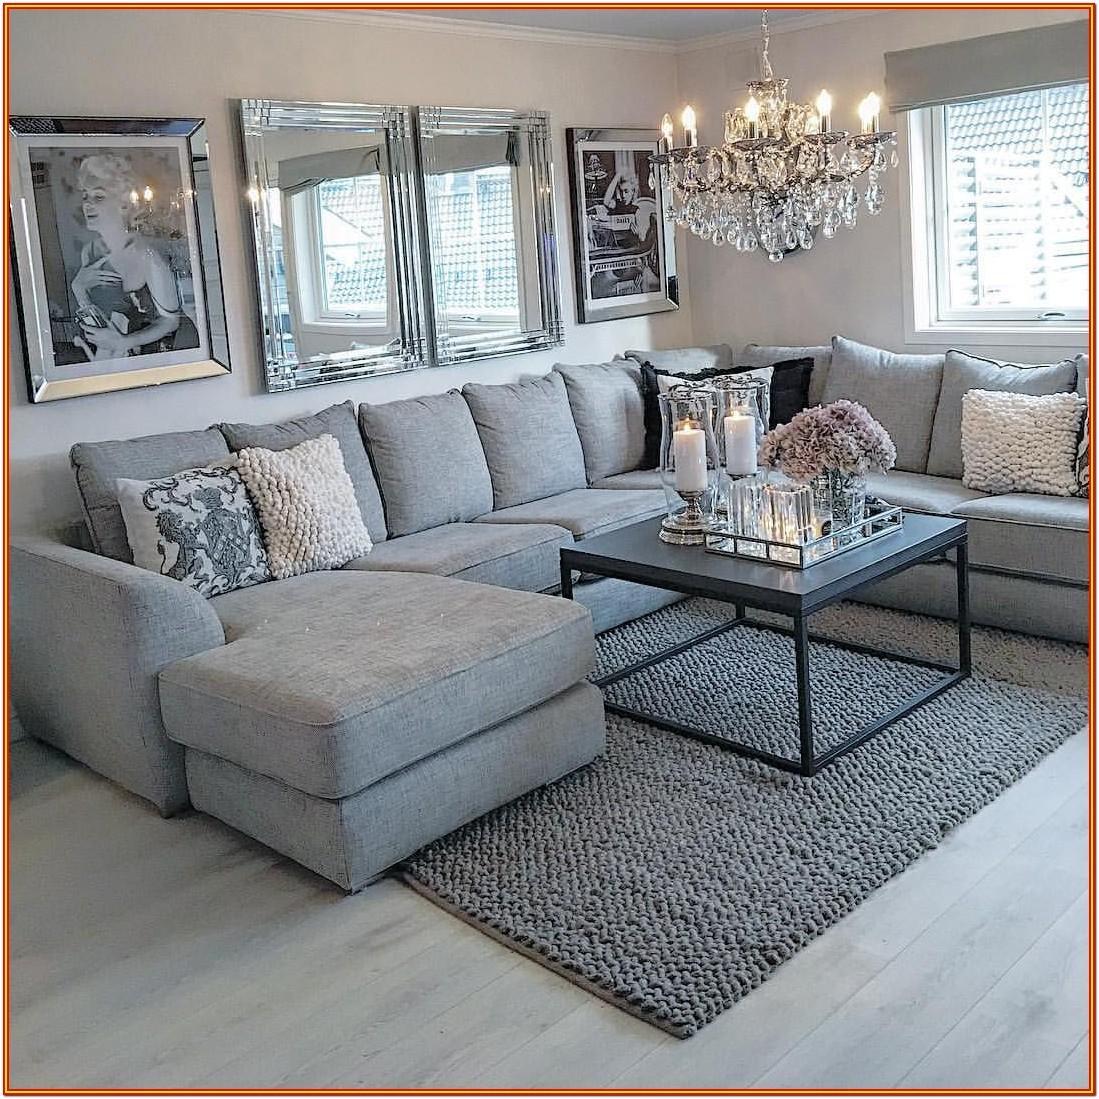 Grey And Black Sofa Living Room Ideas